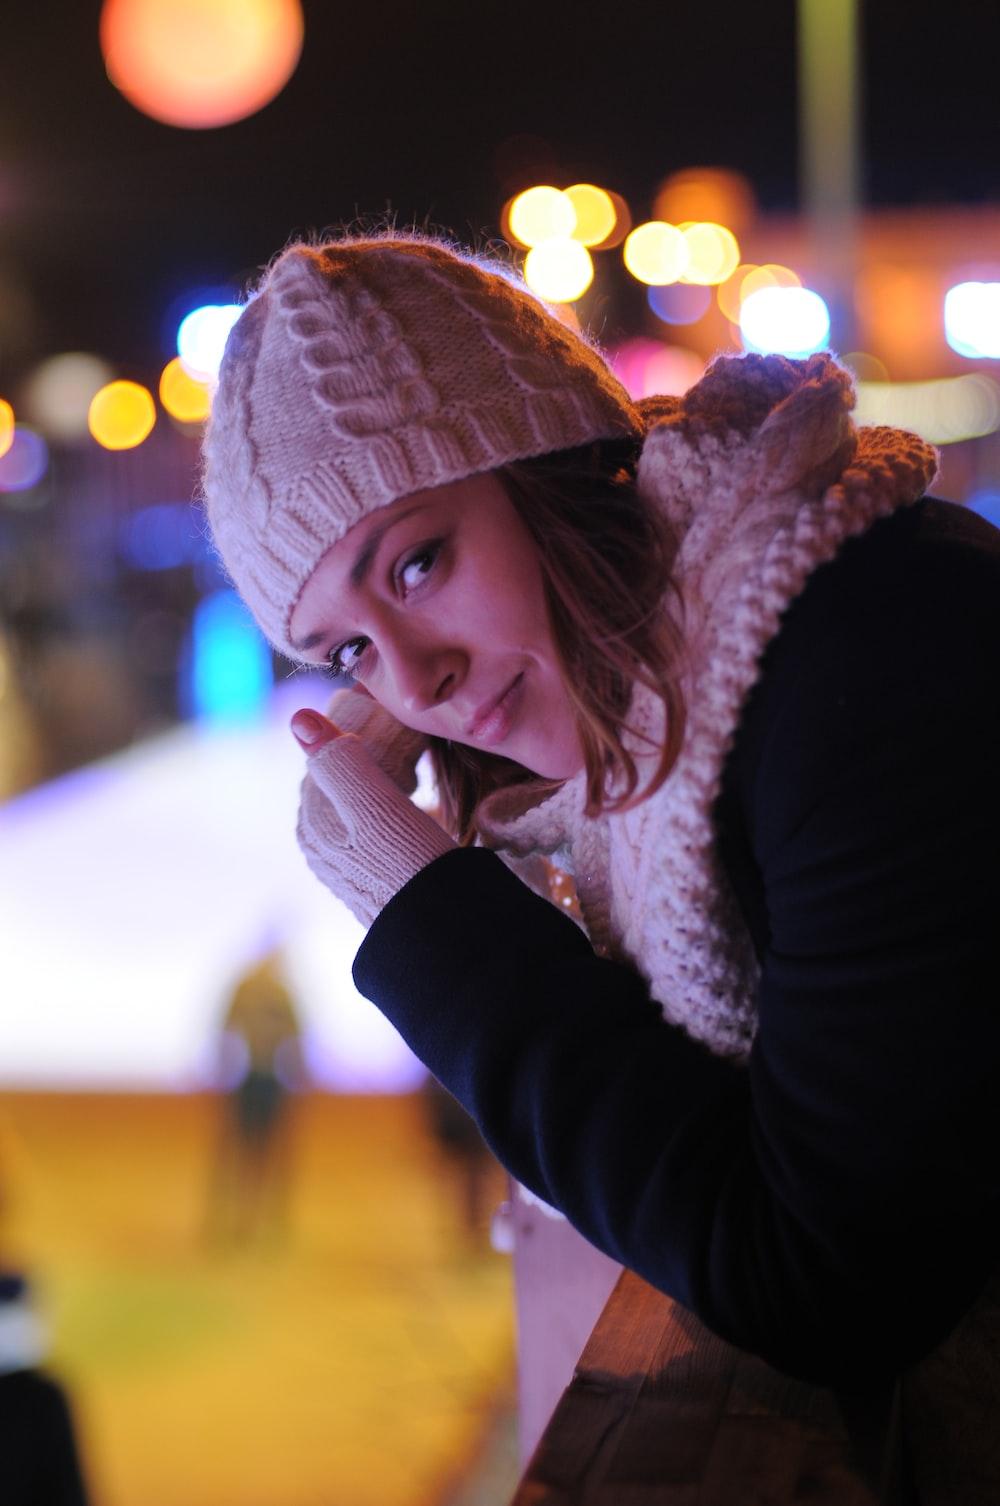 woman in black long sleeve shirt wearing white knit cap